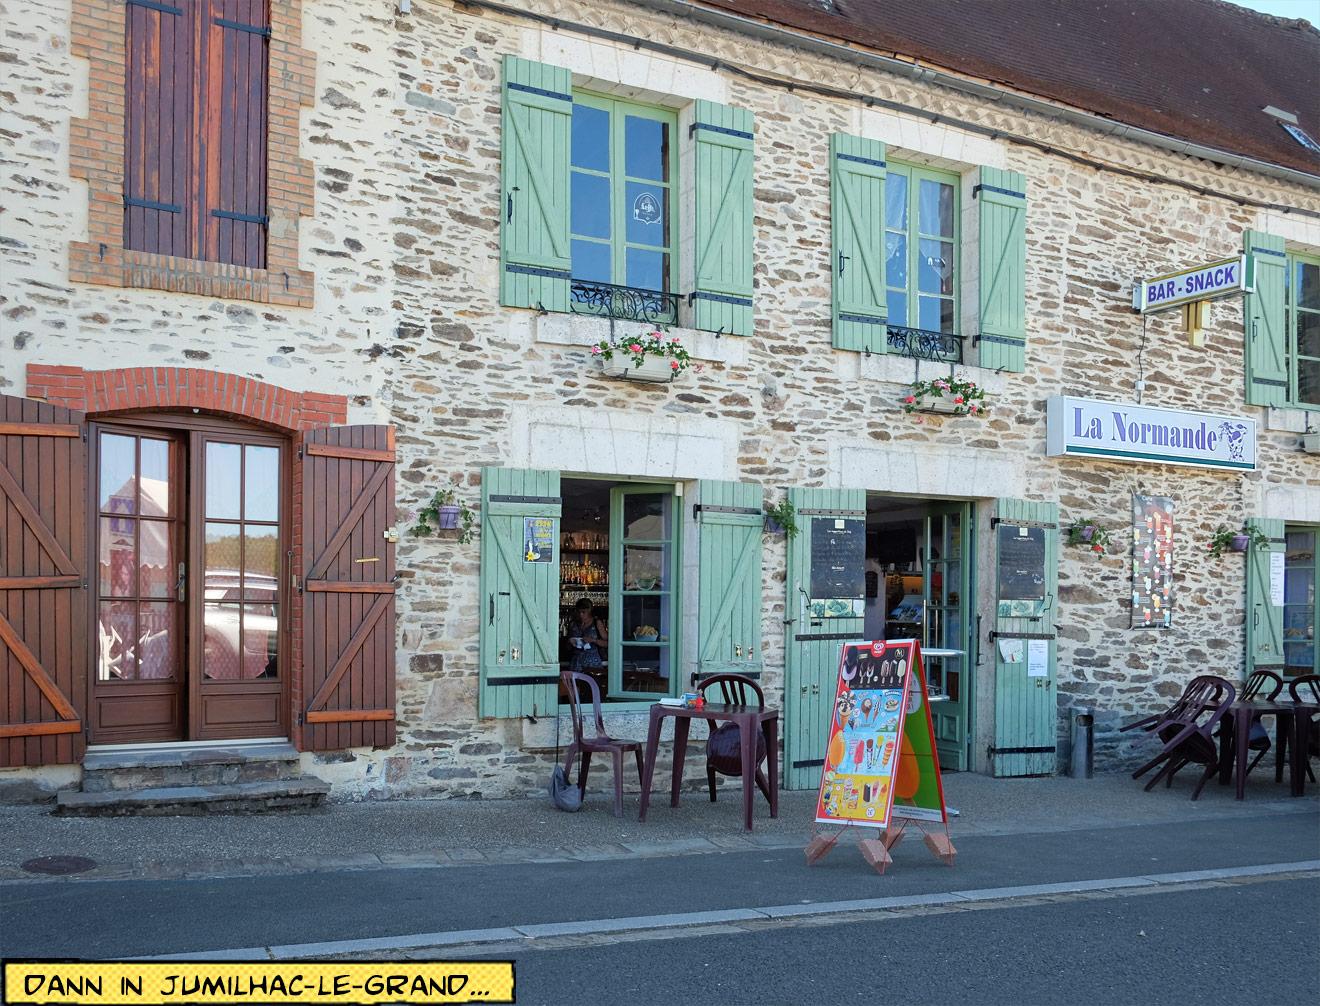 Jumilhac-le-Grand Le Normande